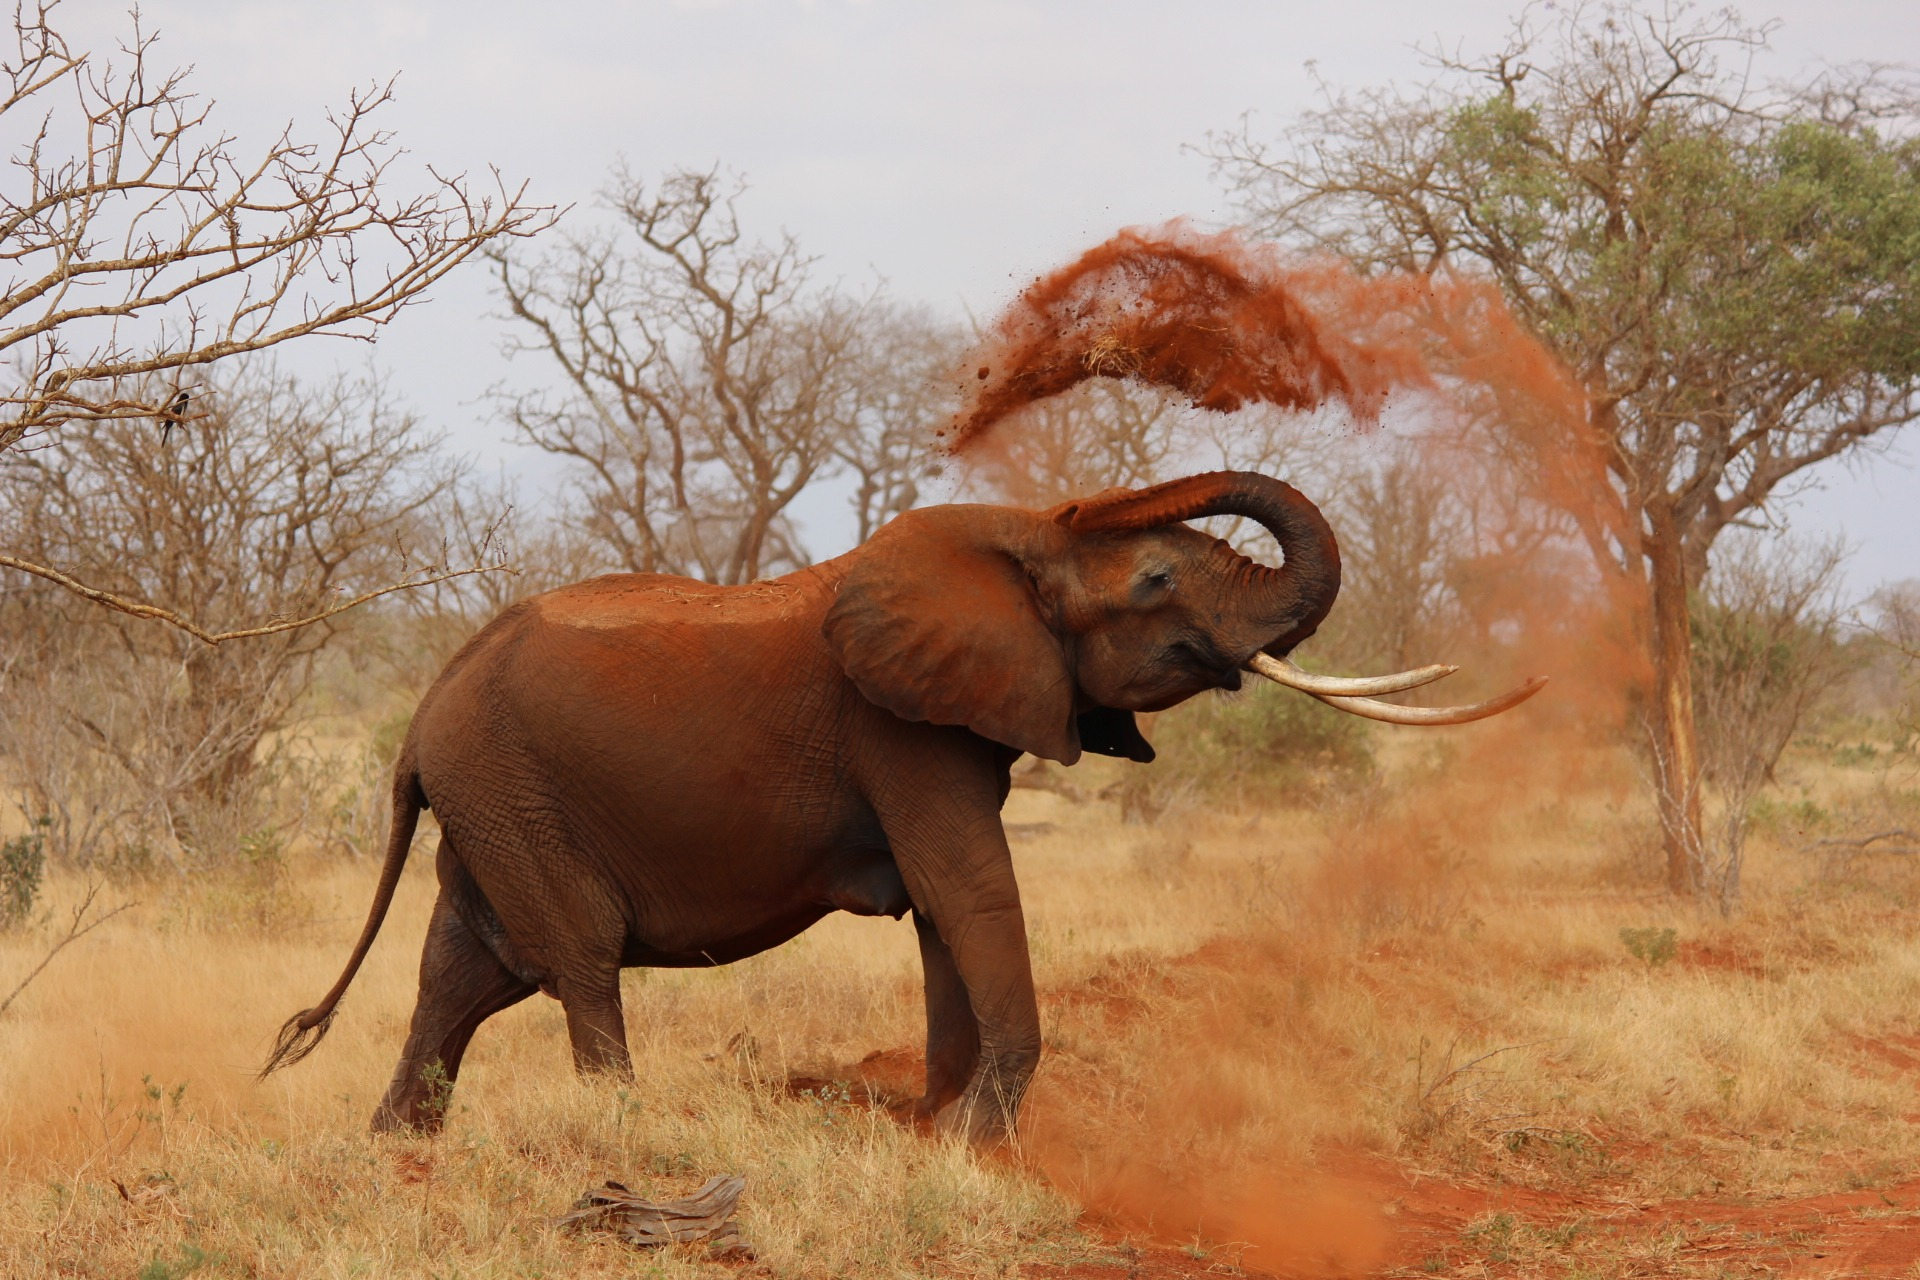 elephant images pexels free stock photos